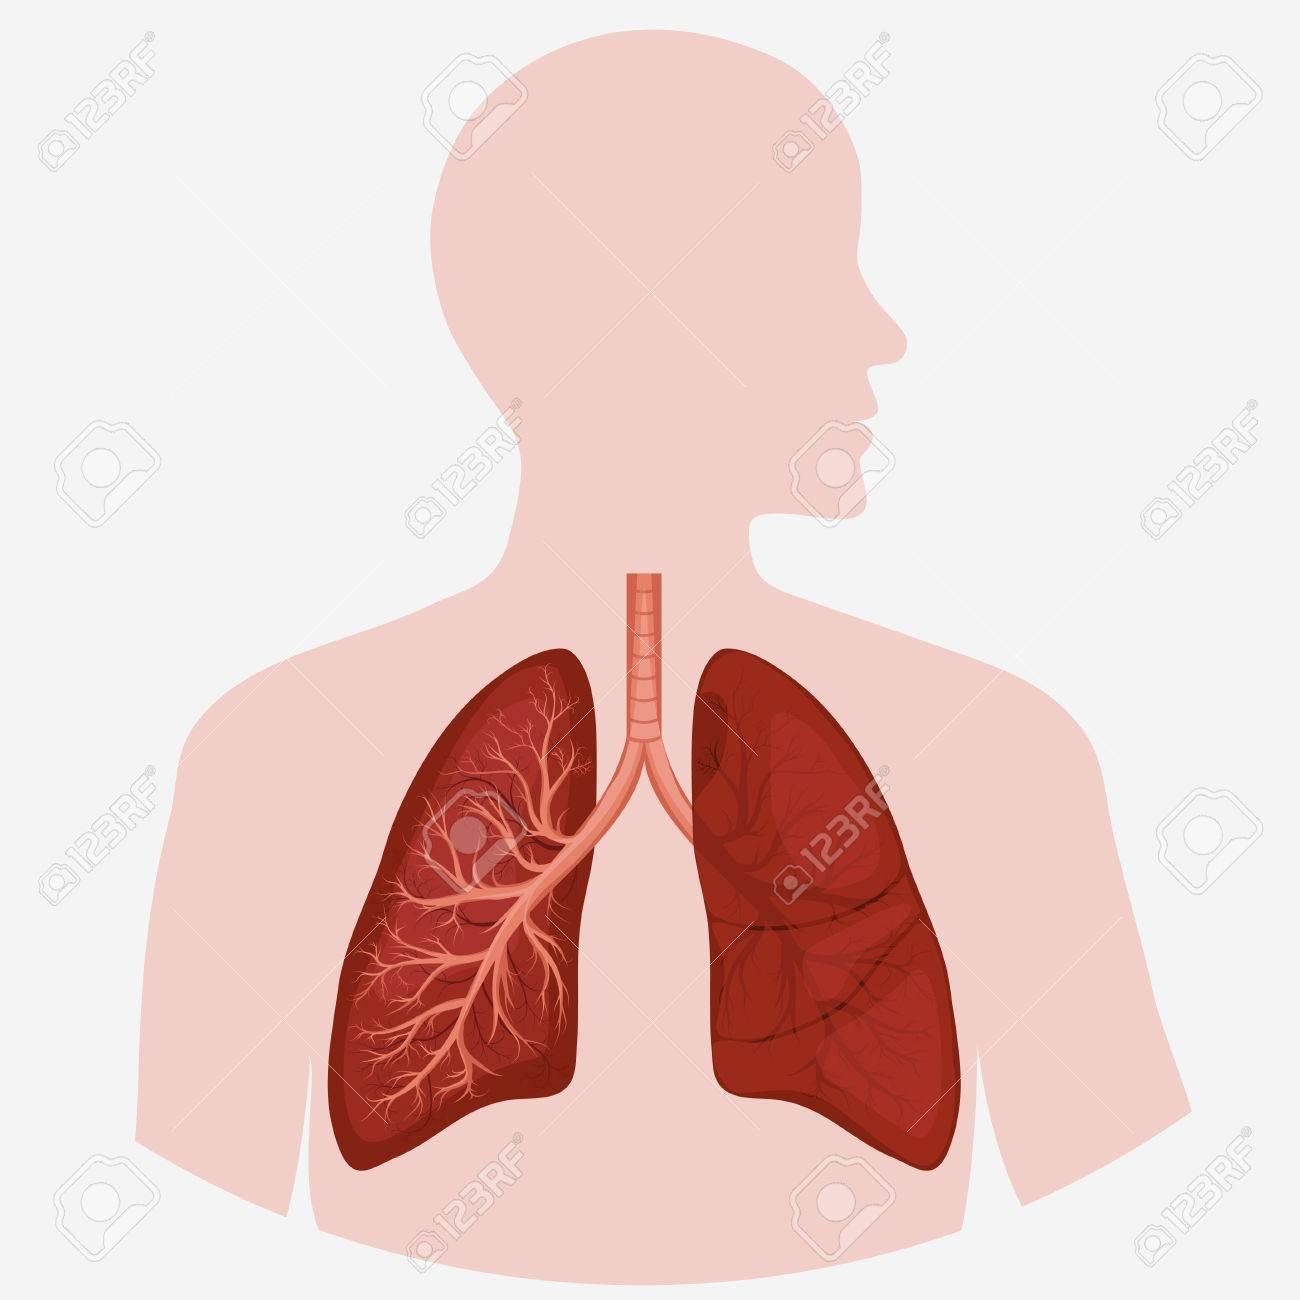 Human Lung Anatomy Diagram Illness Respiratory Cancer Graphics